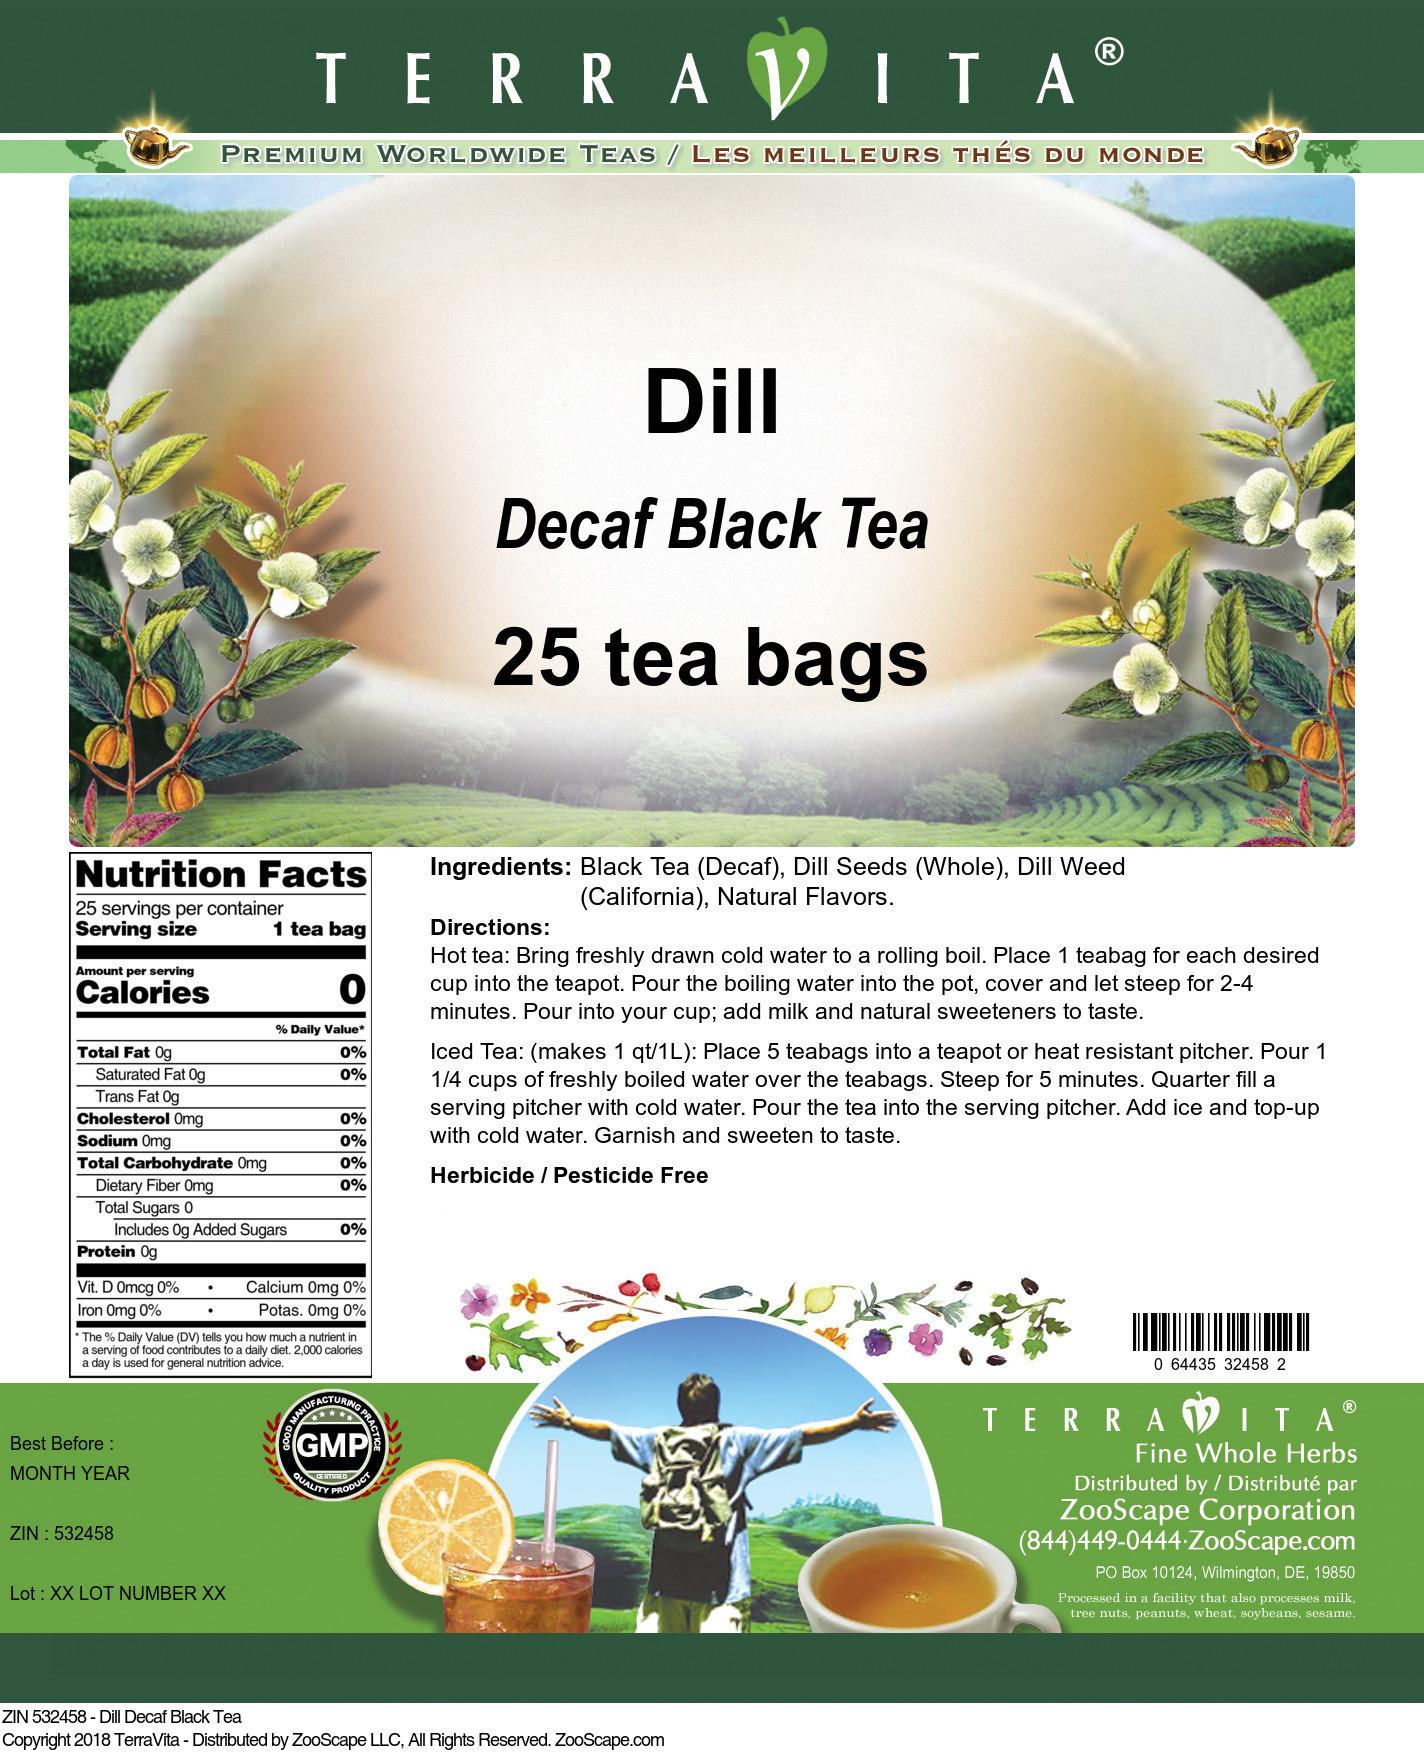 Dill Decaf Black Tea